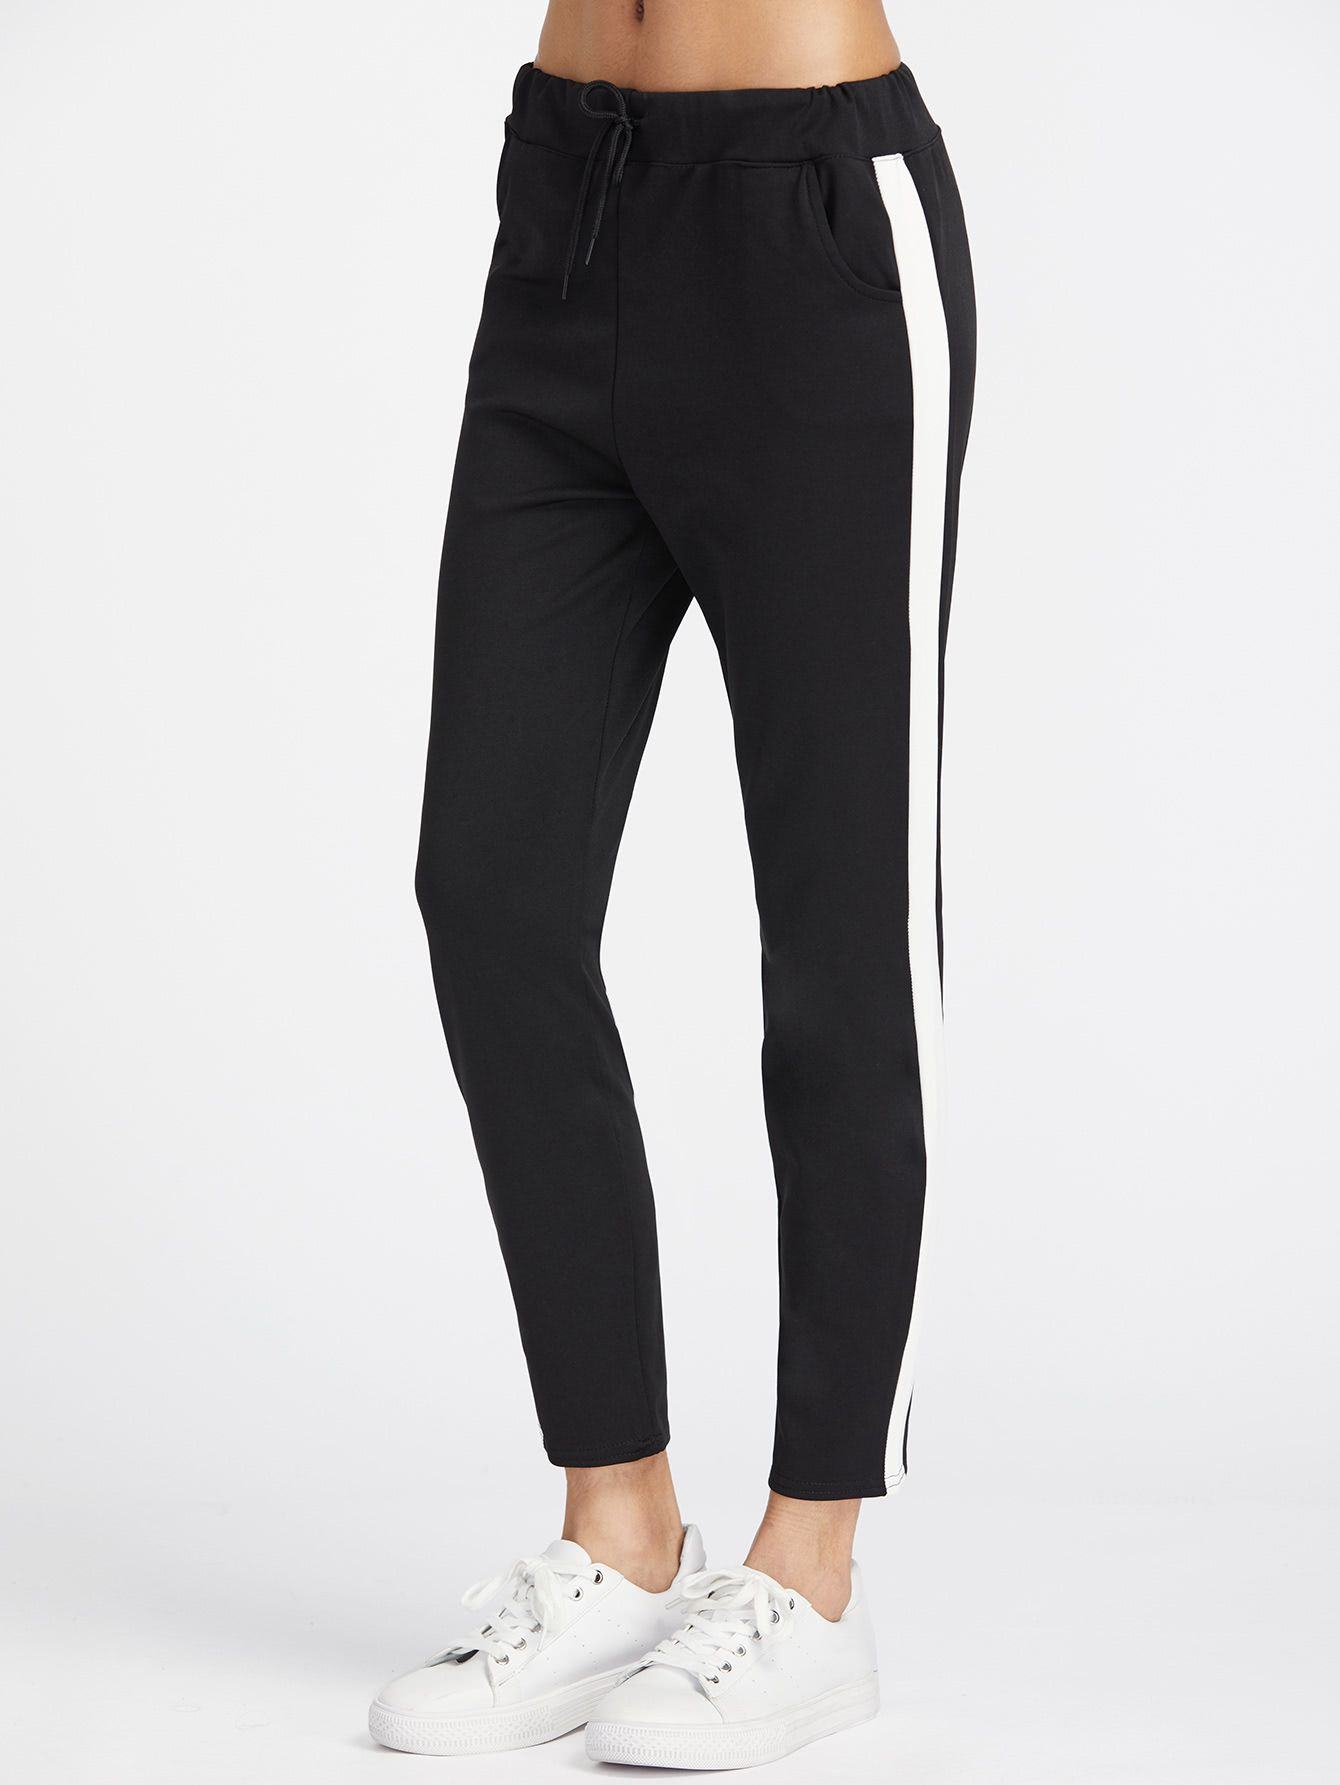 Pantalones con panel y cordón -Spanish SheIn(Sheinside)  e42dc02c4390